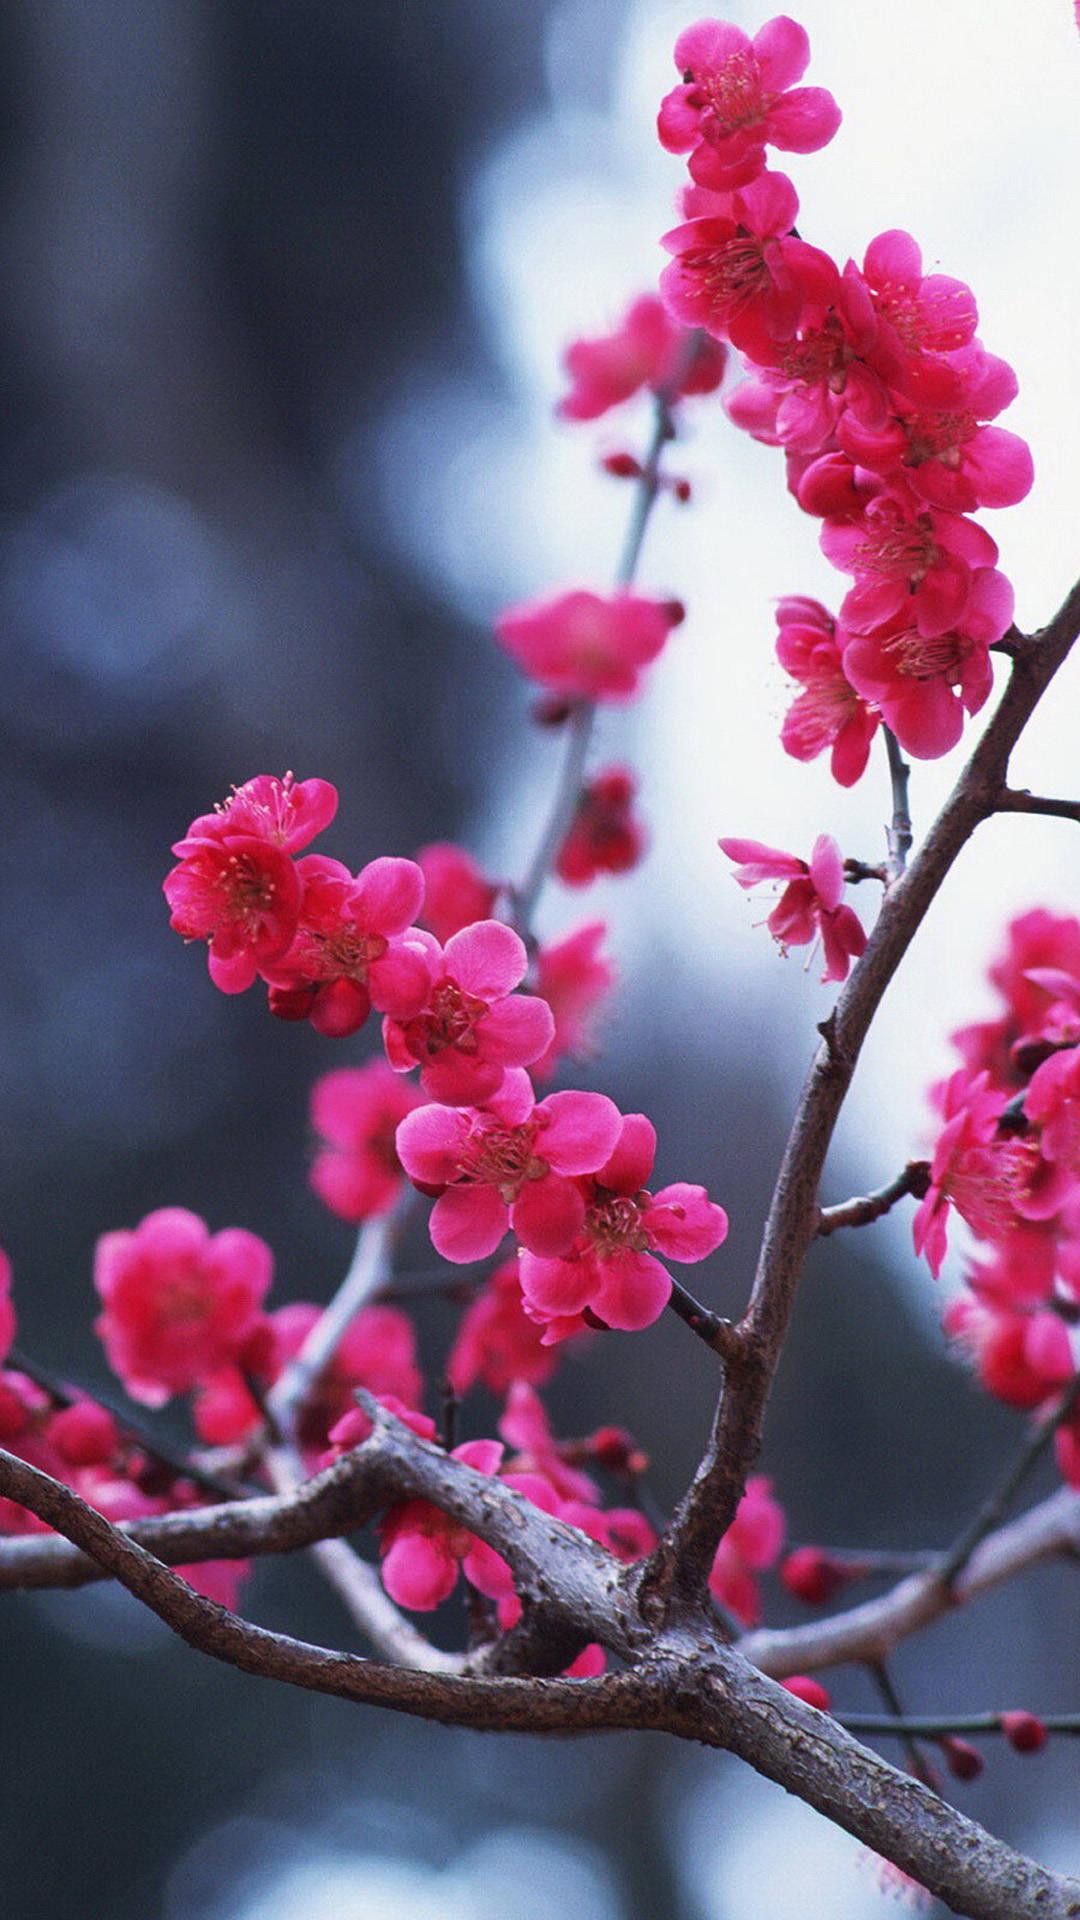 Inspirational Quotes Wallpaper Hd Free Download Cherry Blossom Iphone Hd Wallpaper Pixelstalk Net